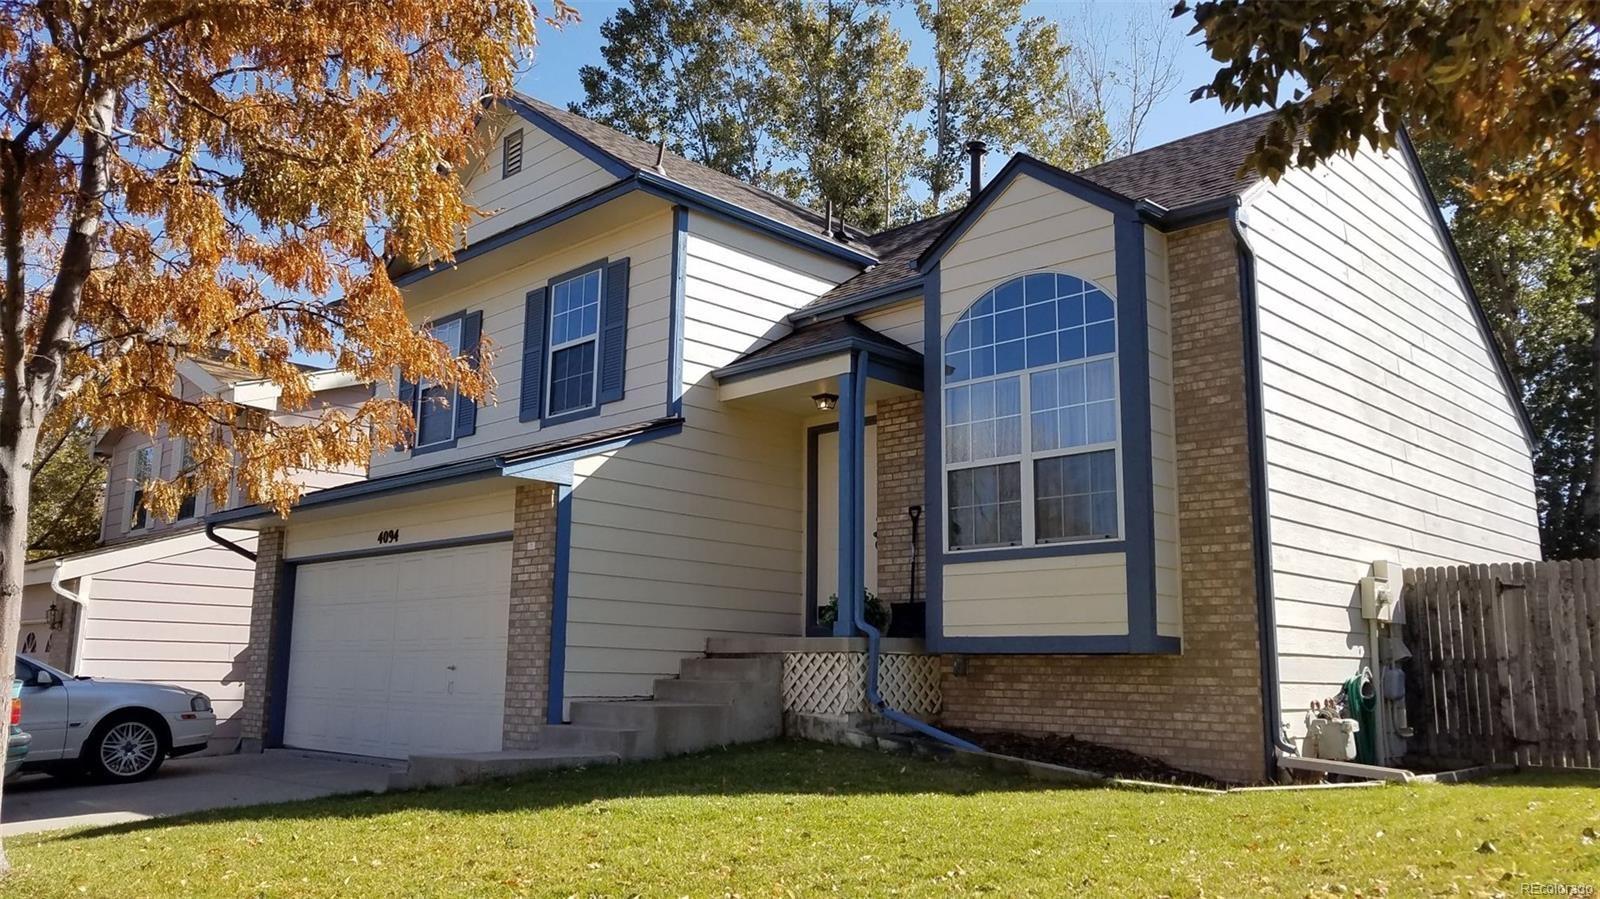 MLS# 9169381 - 1 - 4094  E 131st Drive, Thornton, CO 80241